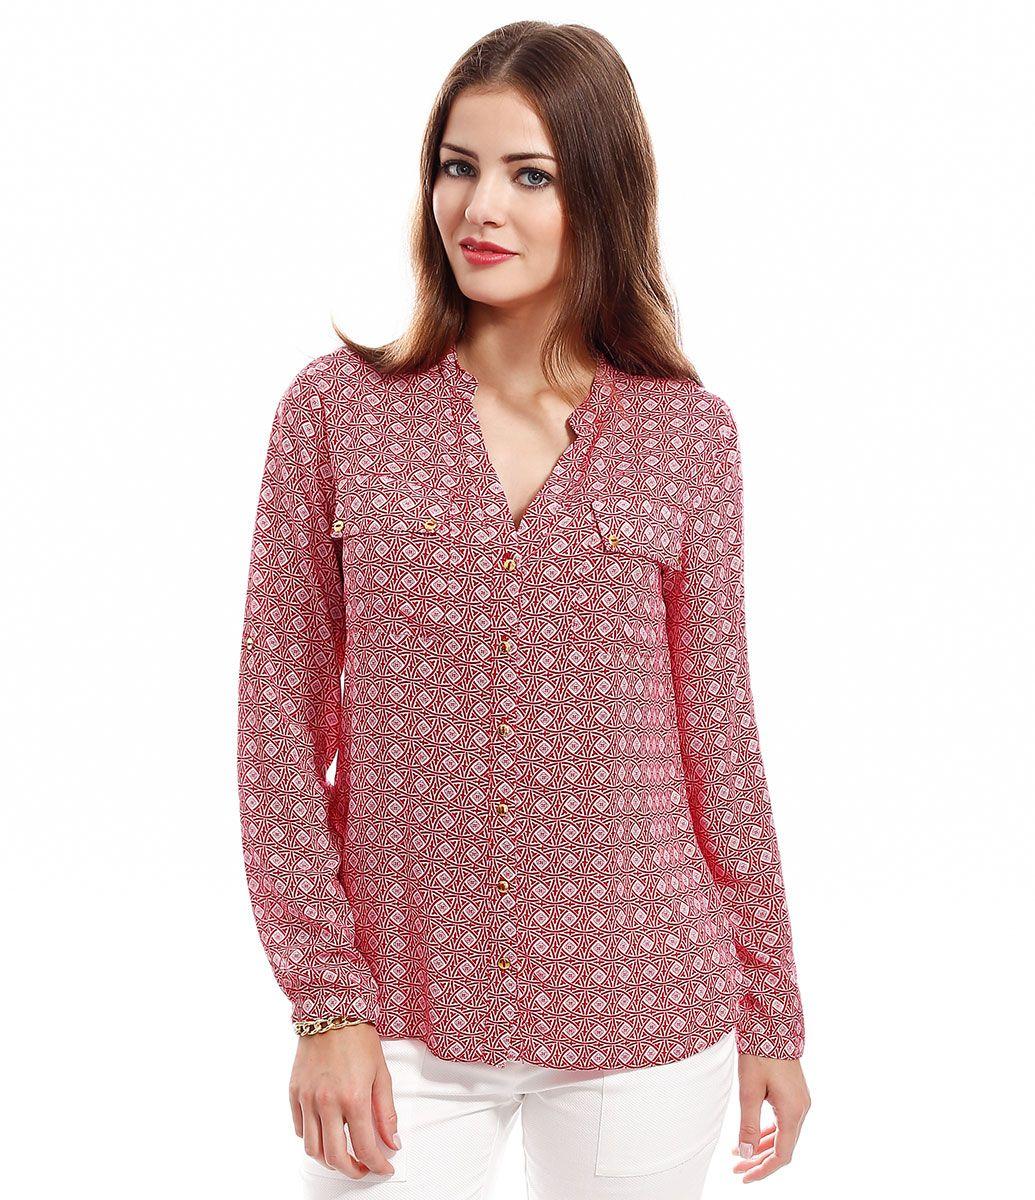 e2834299b6 Camisa Feminina Estampada - Lojas Renner